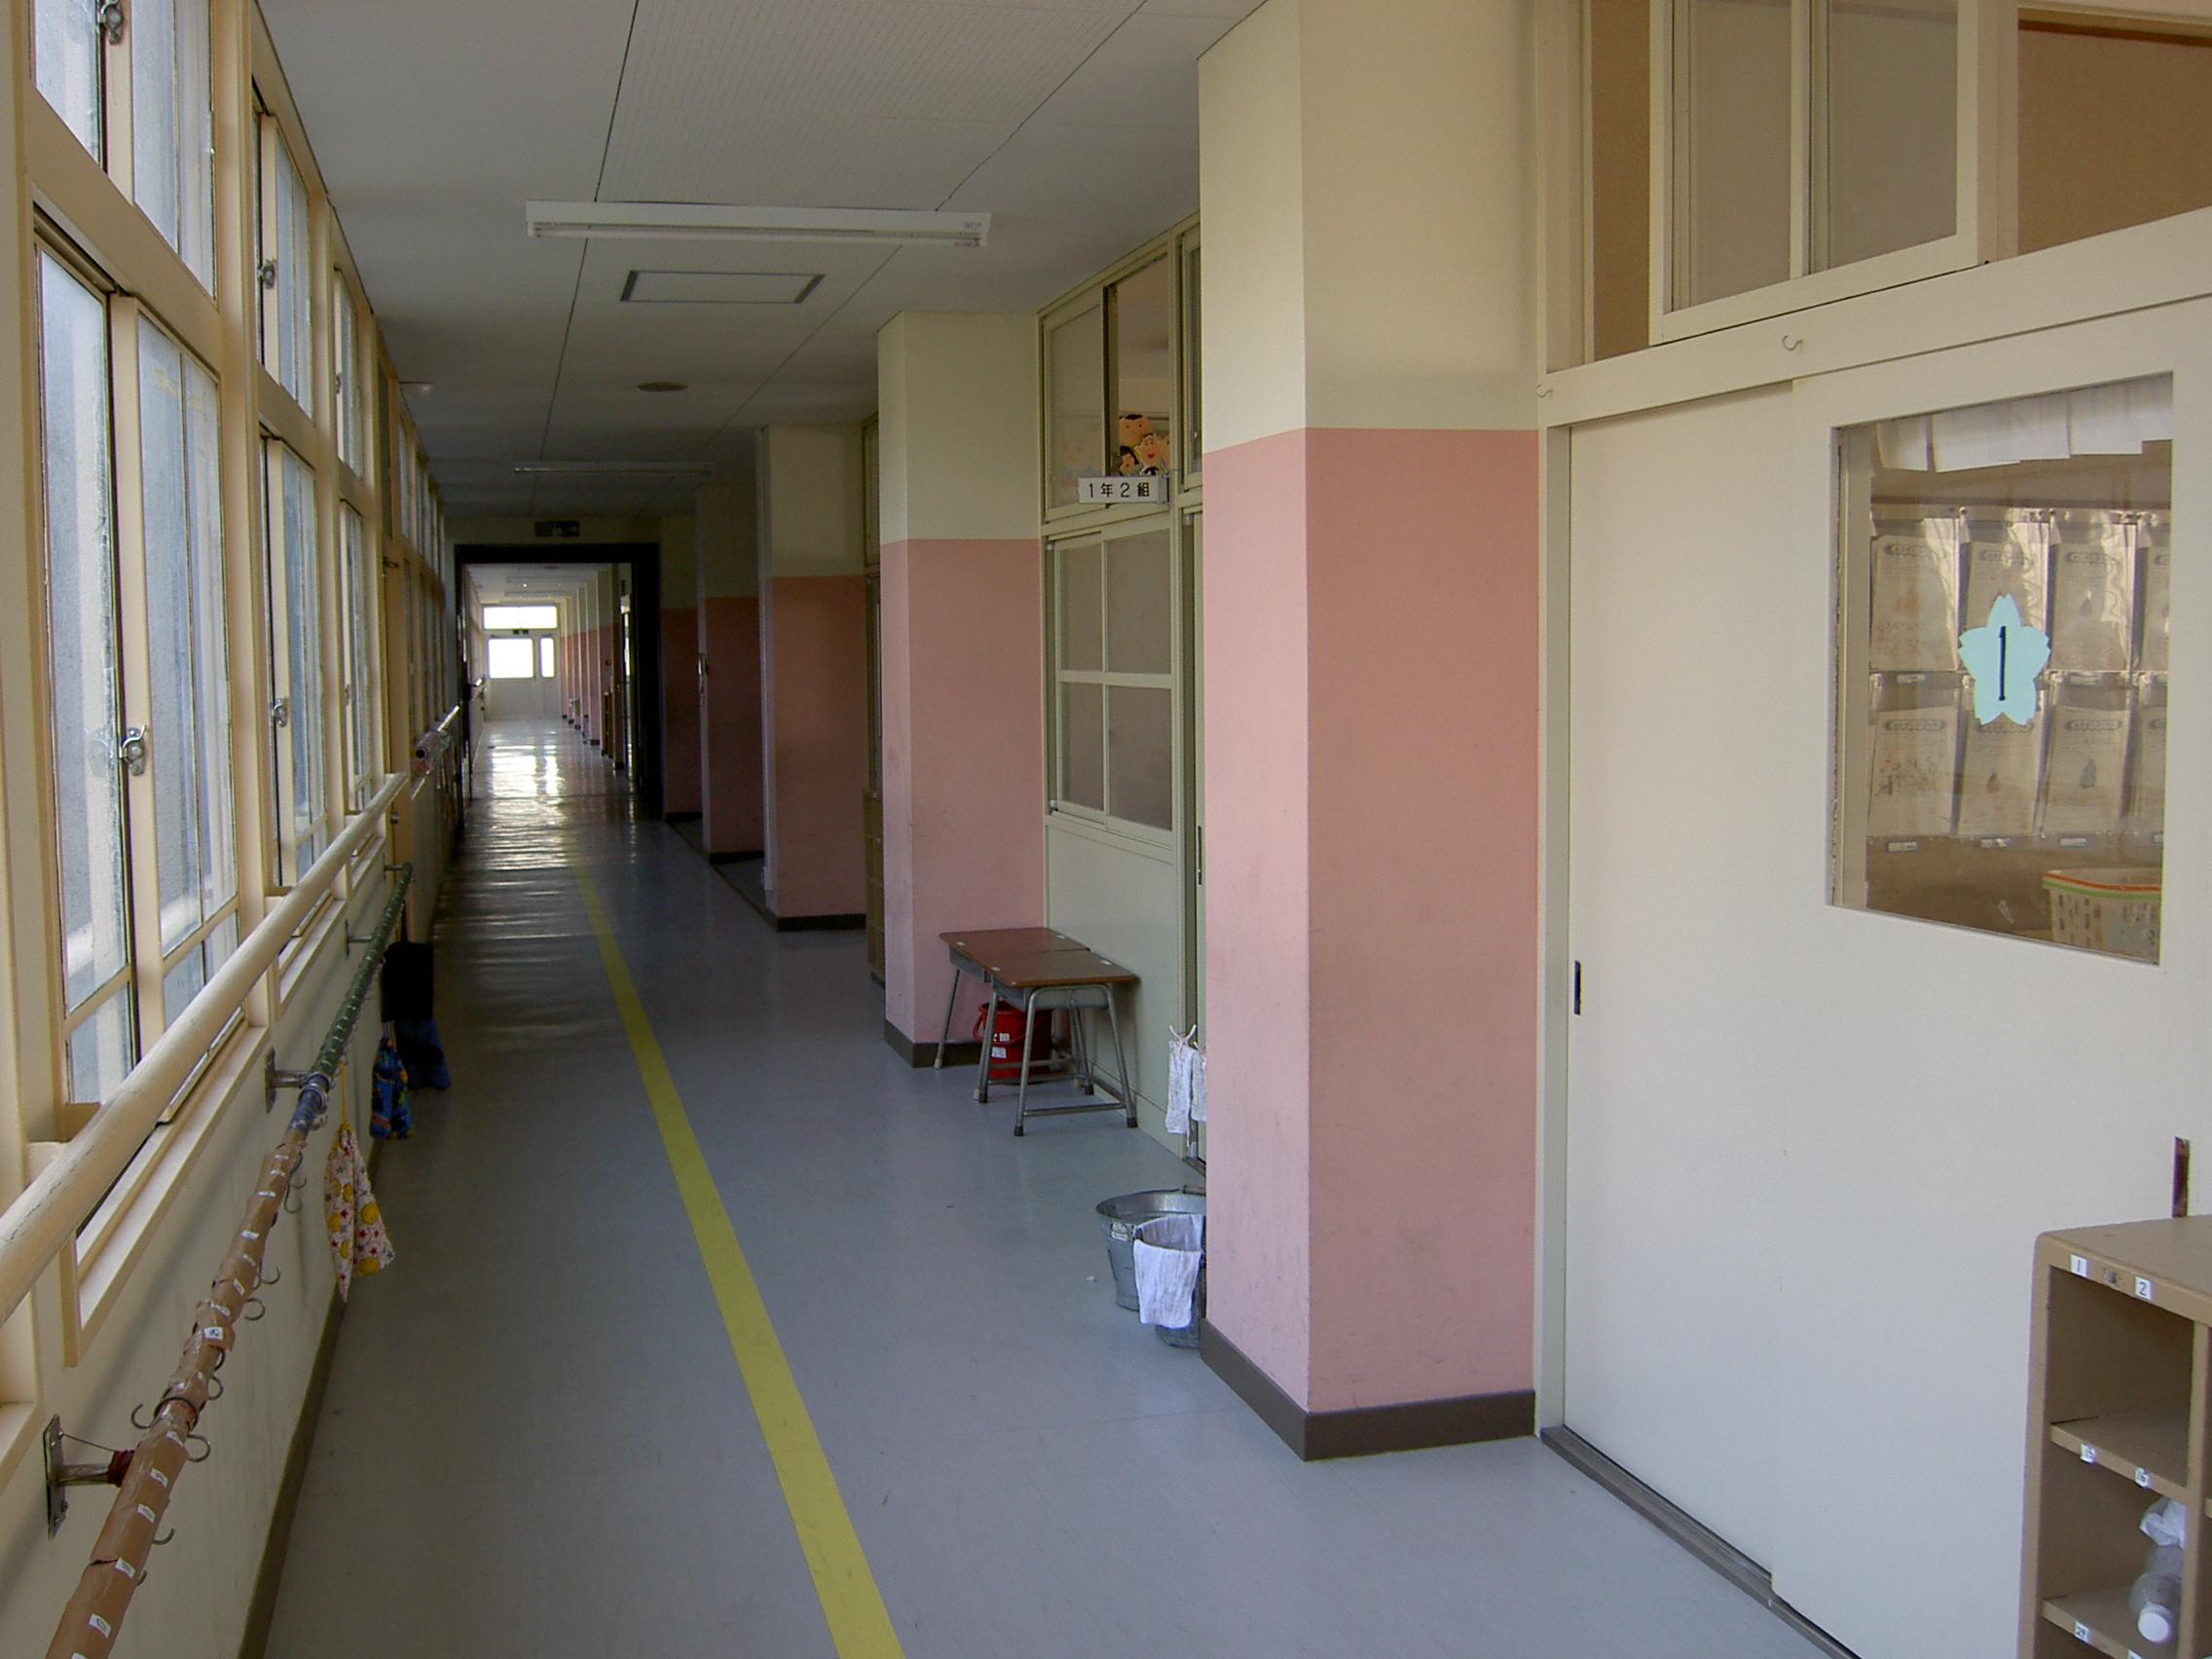 Corridore clipart classroom City  Koyo File:Hirakata of